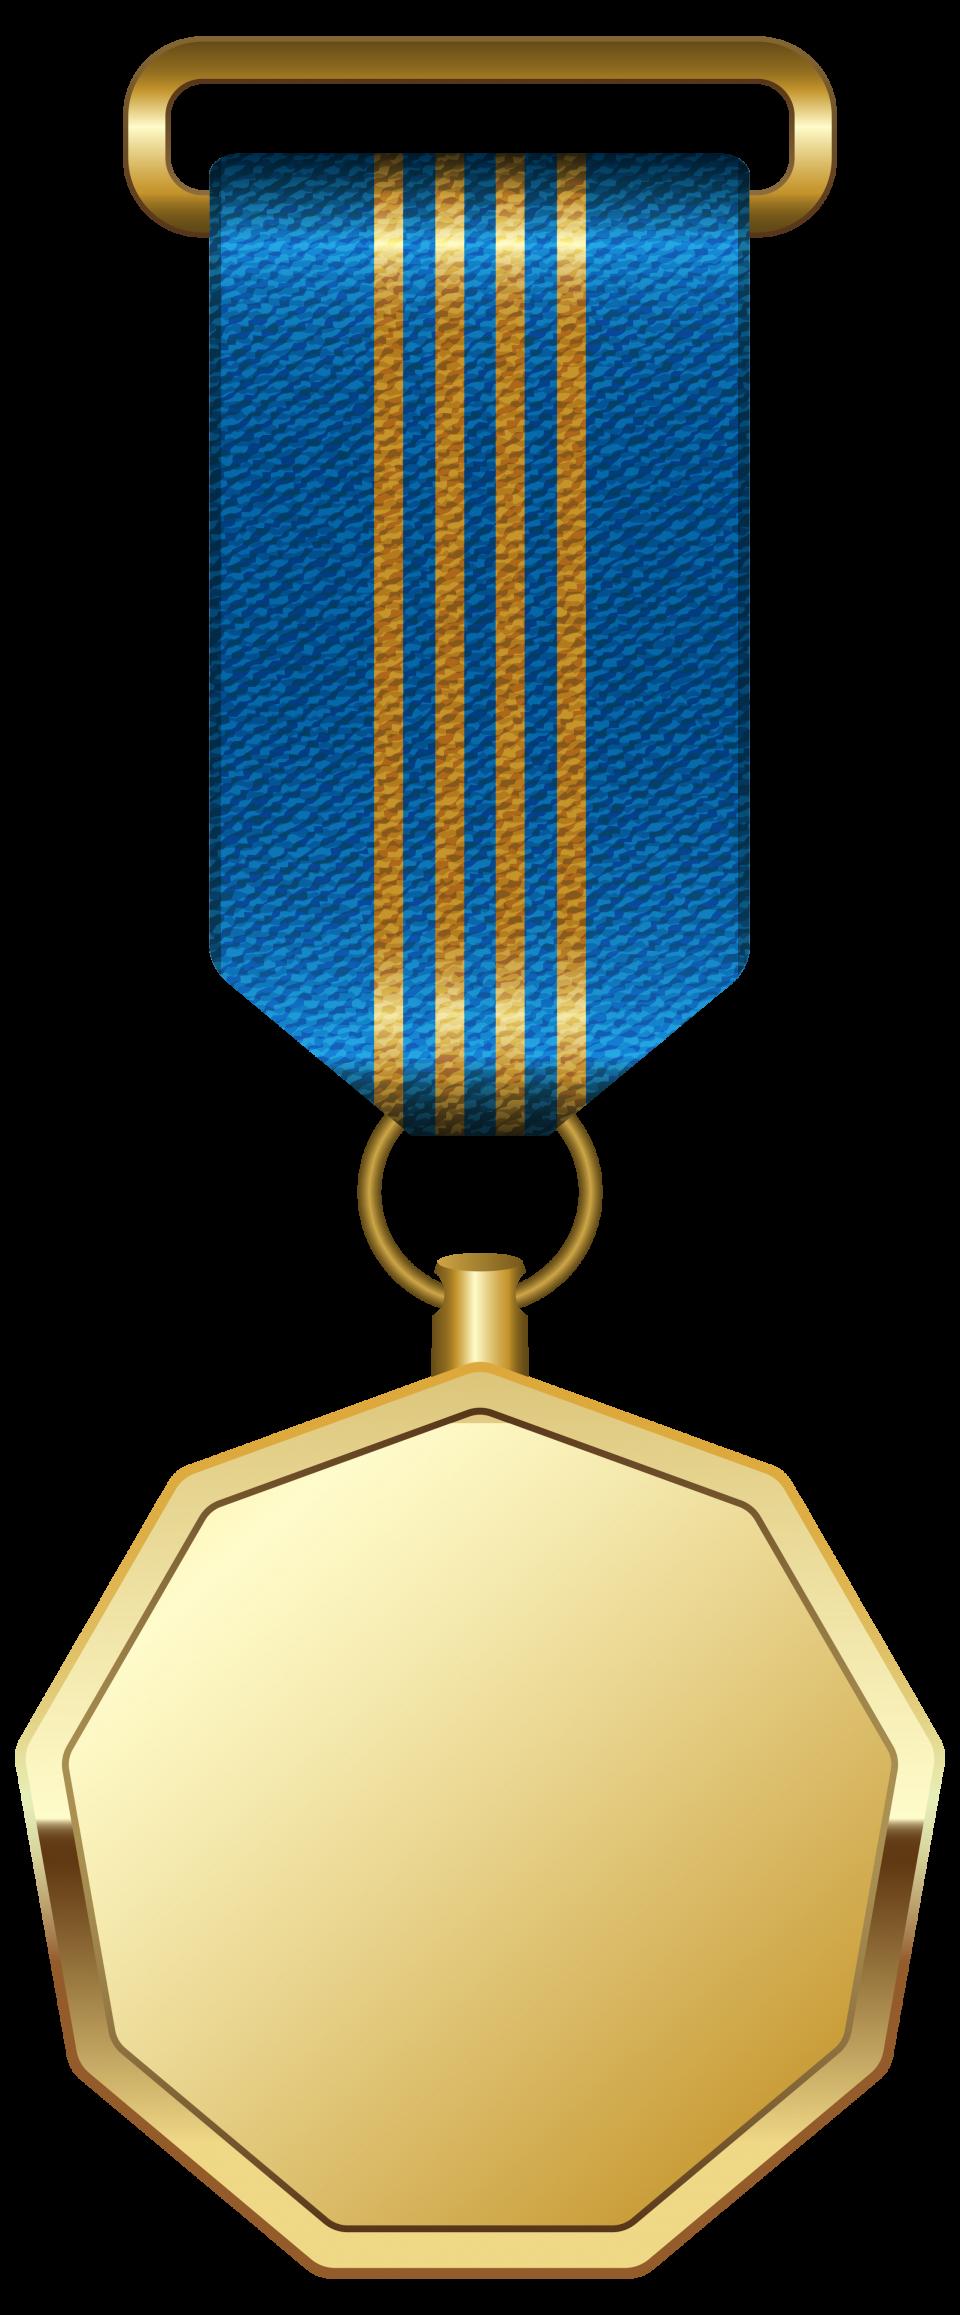 Gold Medal Png Image Ribbon Png Gold Medal Blue Ribbon